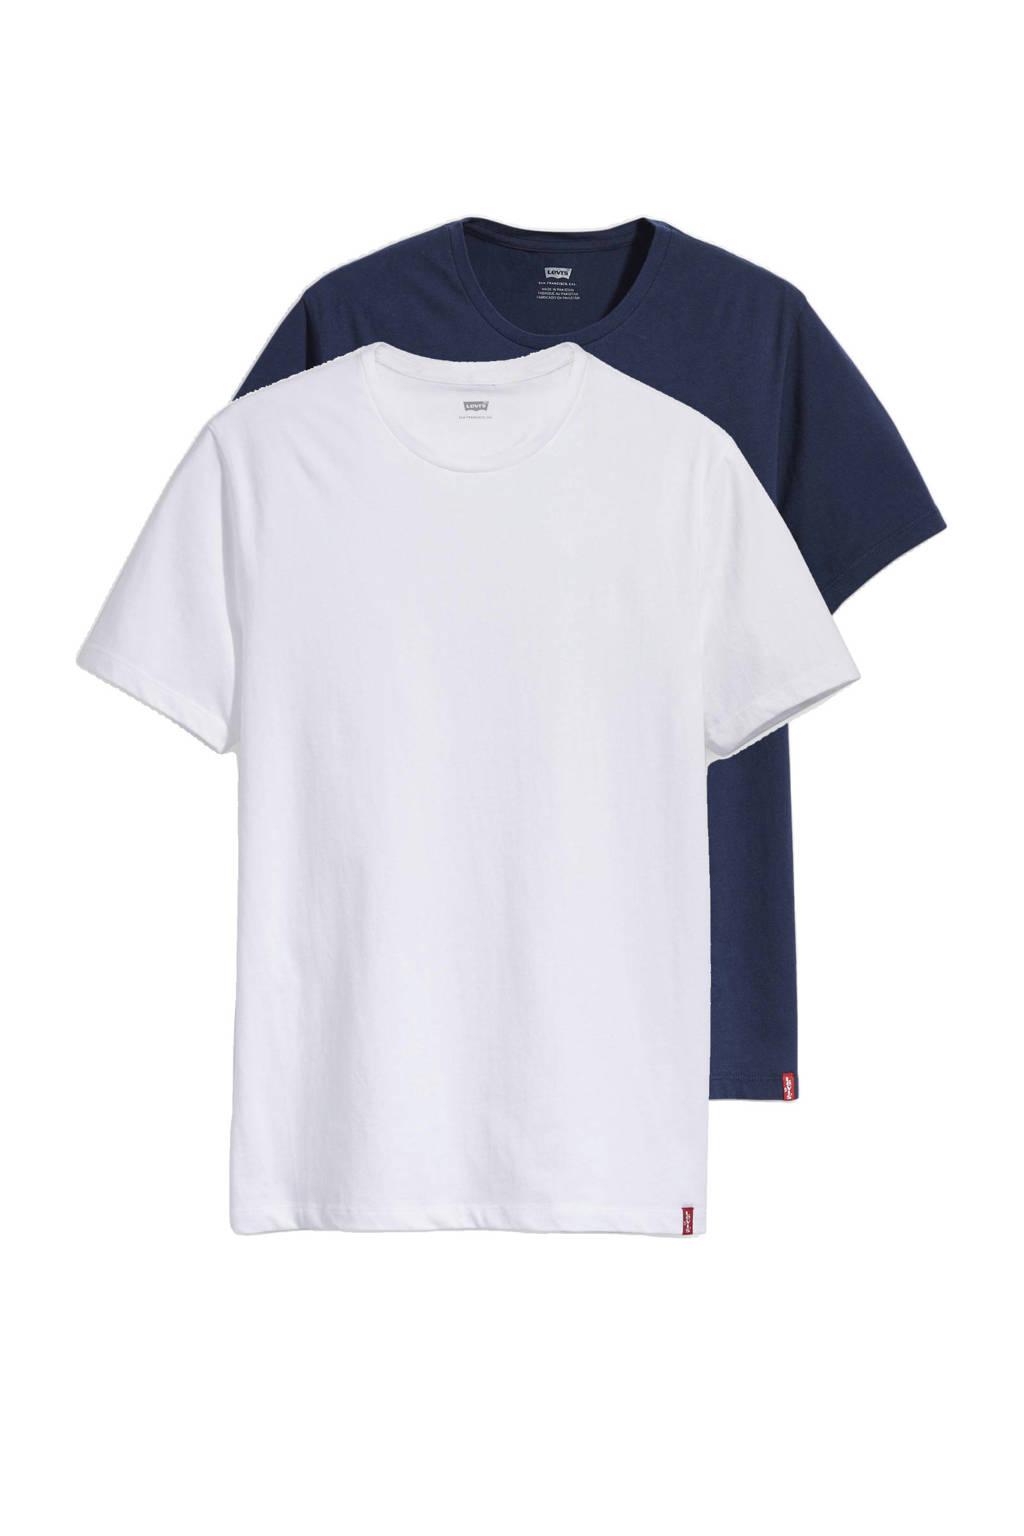 Levi's T-shirt - set van 2, Wit/donkerblauw